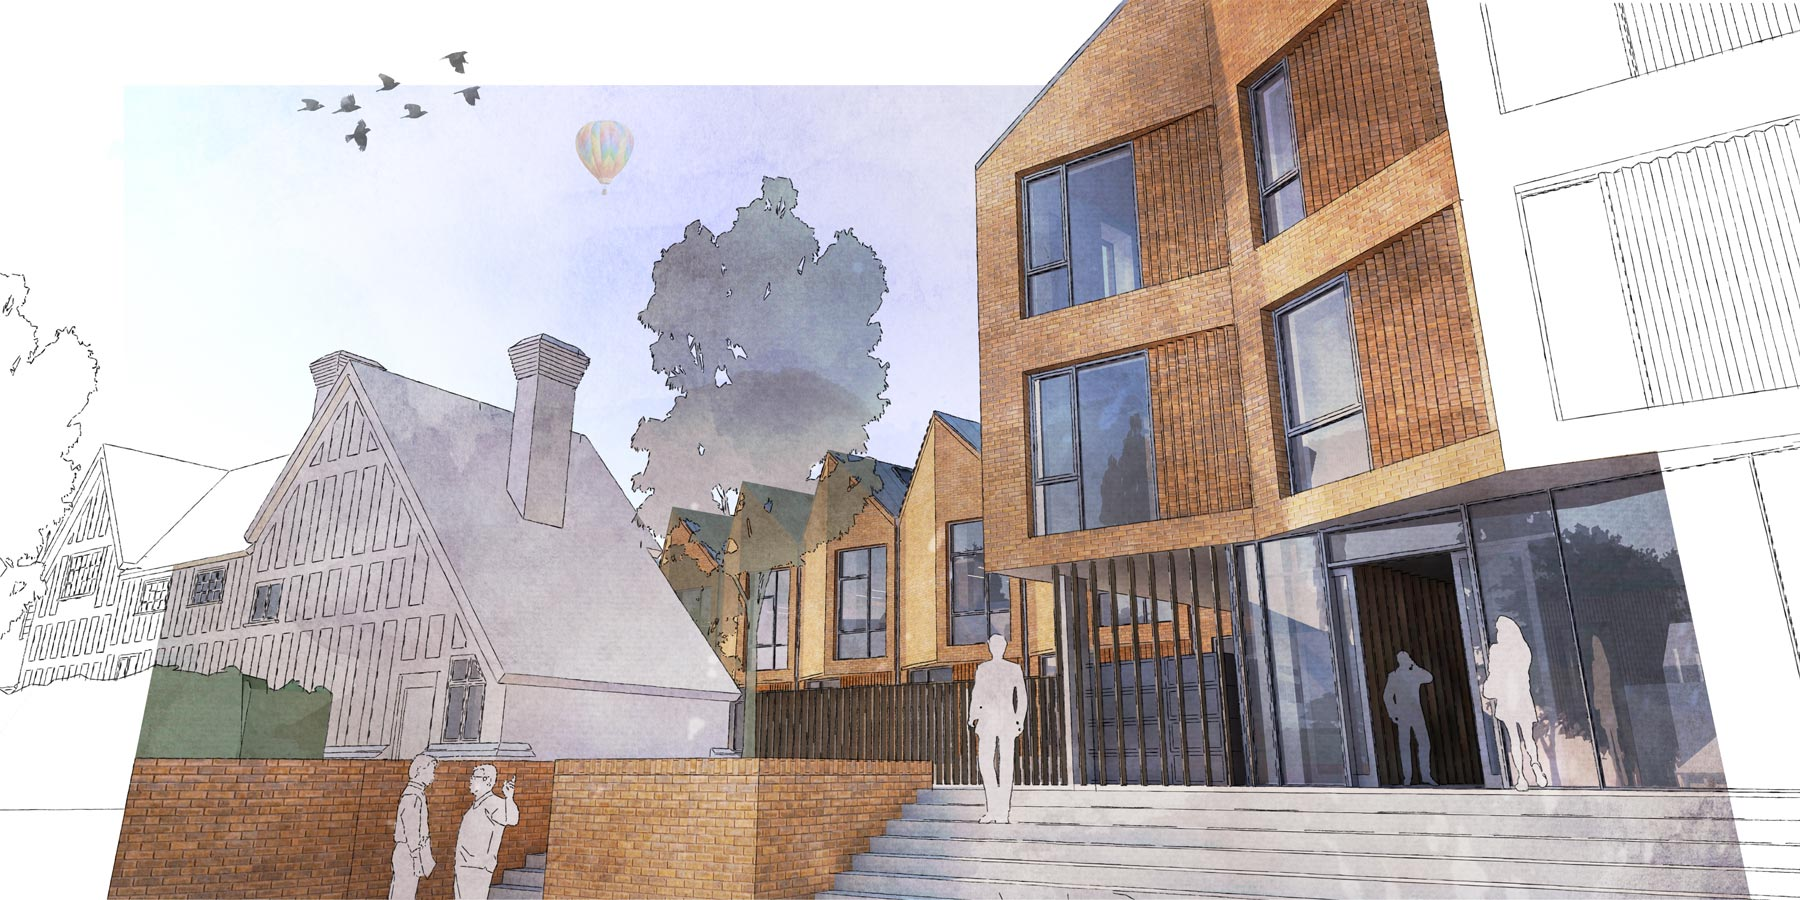 Berkhamsted 6th form corner view illustration